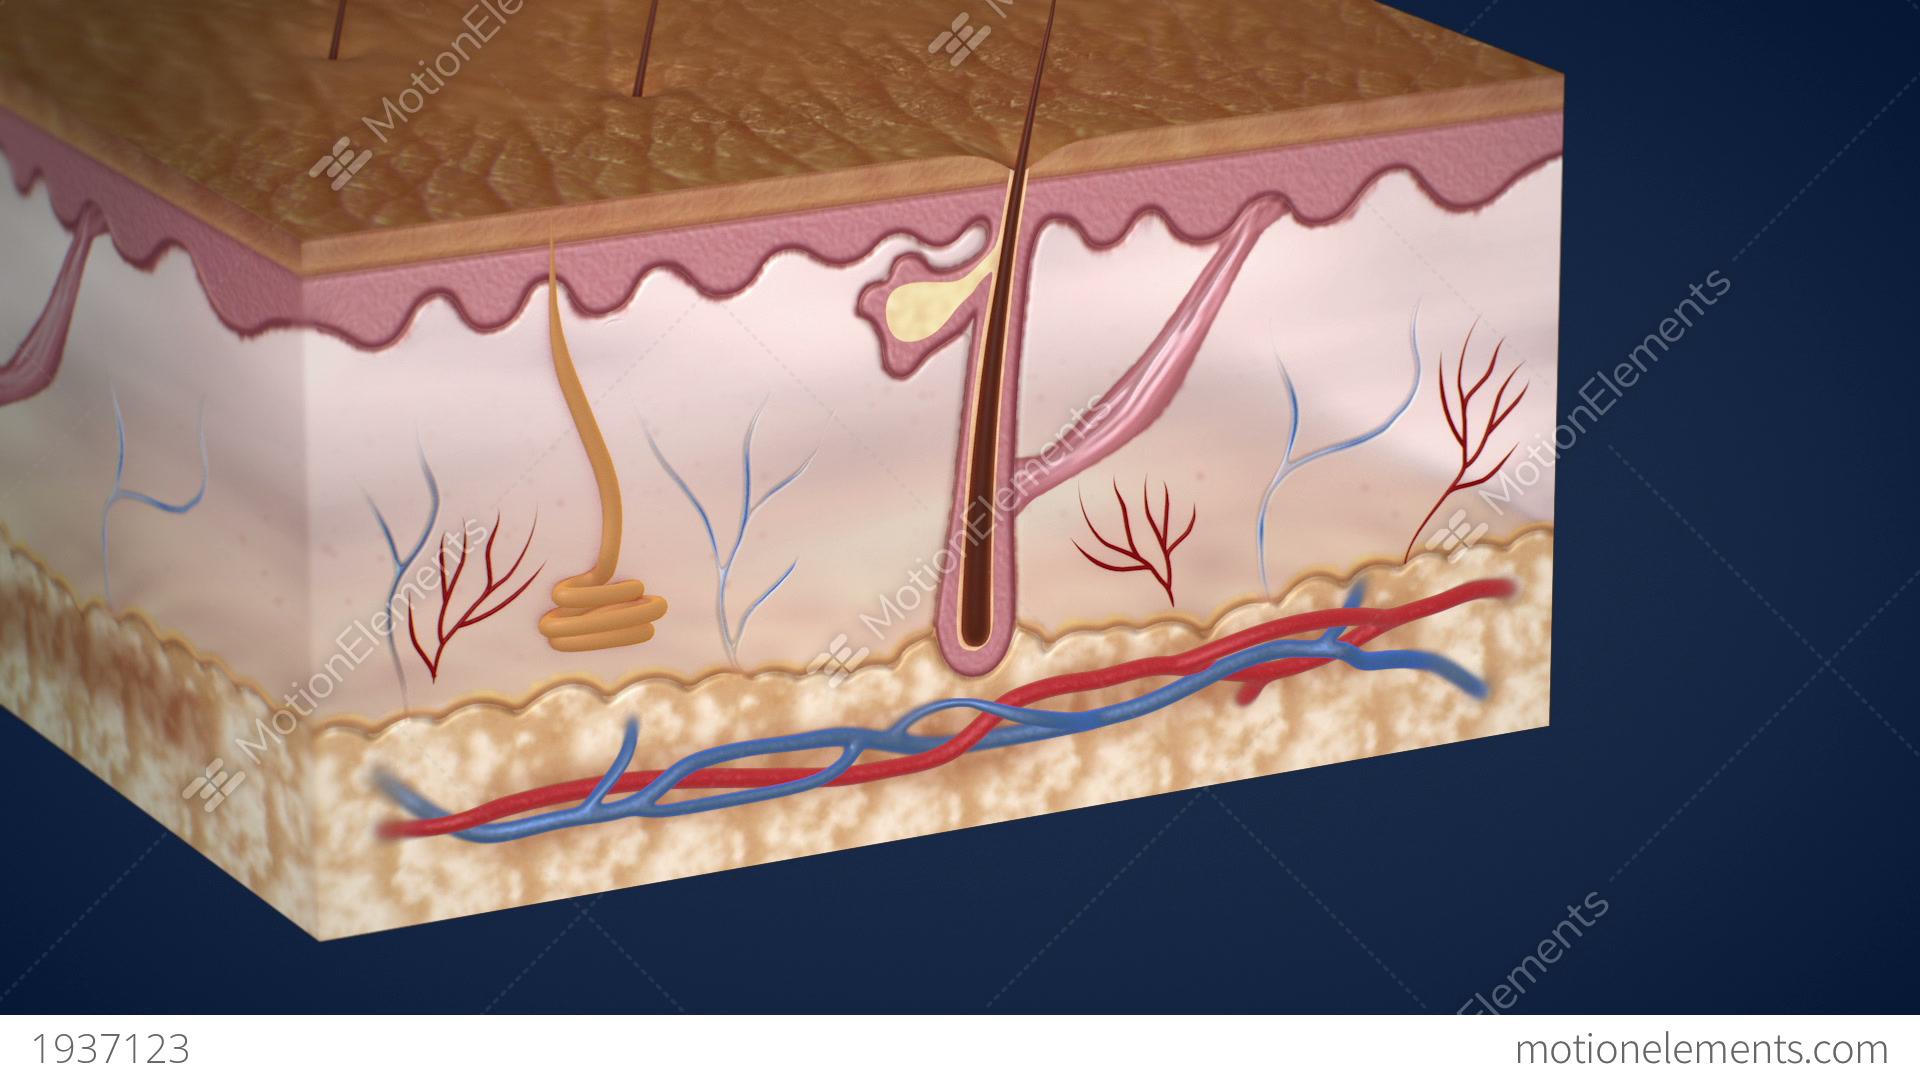 Unique Anatomy Of Skin Adornment - Human Anatomy Images ...